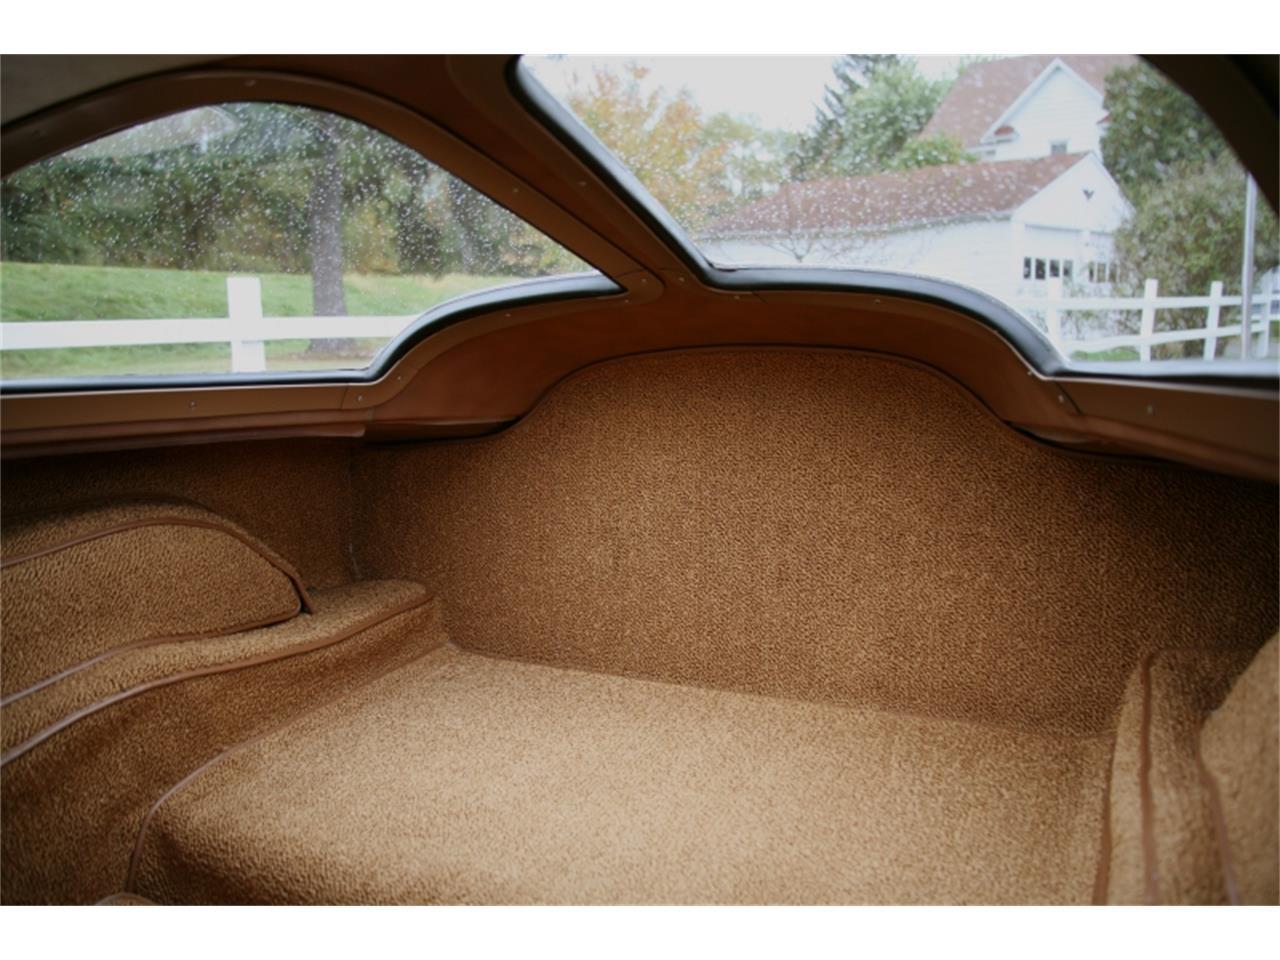 Large Picture of Classic '63 Chevrolet Corvette - $99,500.00 - MK1L